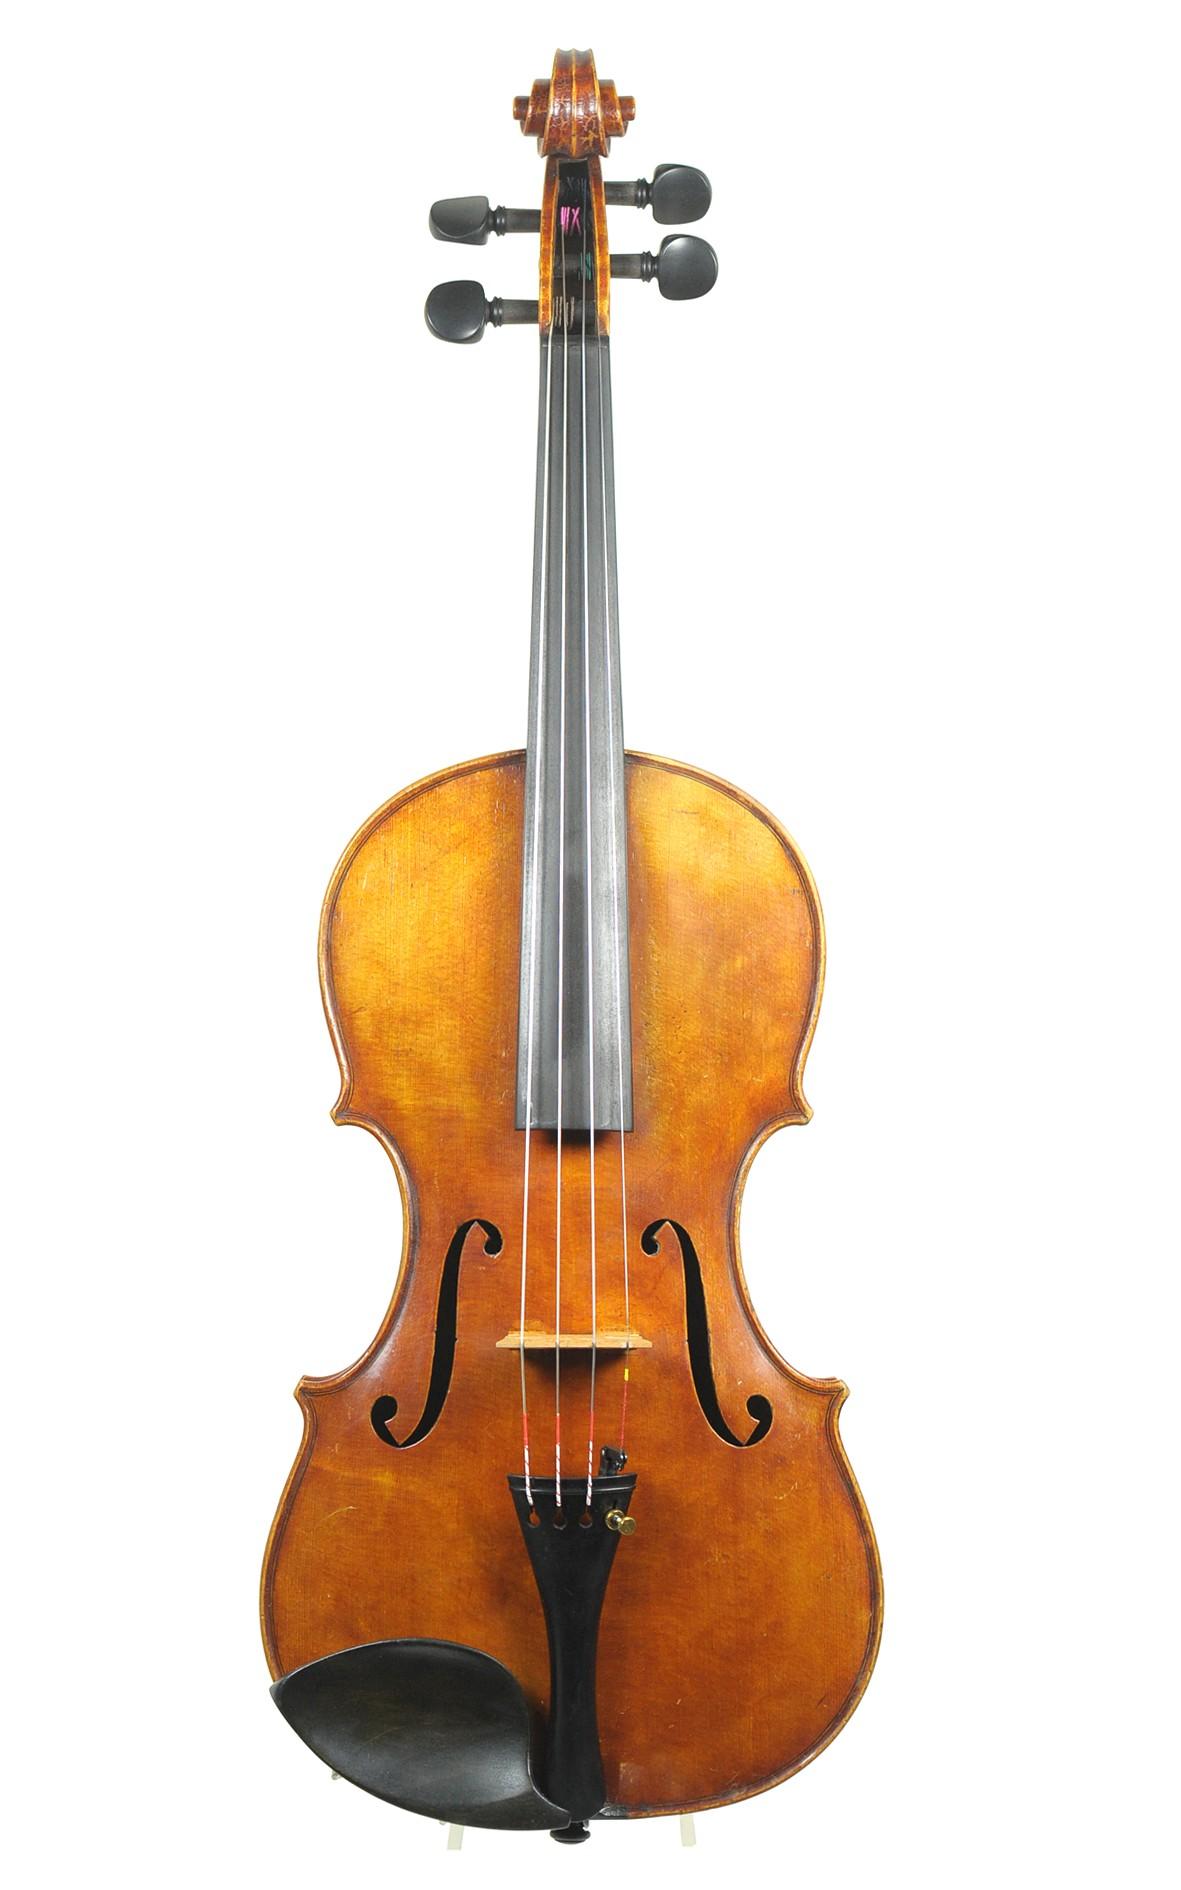 English master violin no. 50 by George Hudson  - top